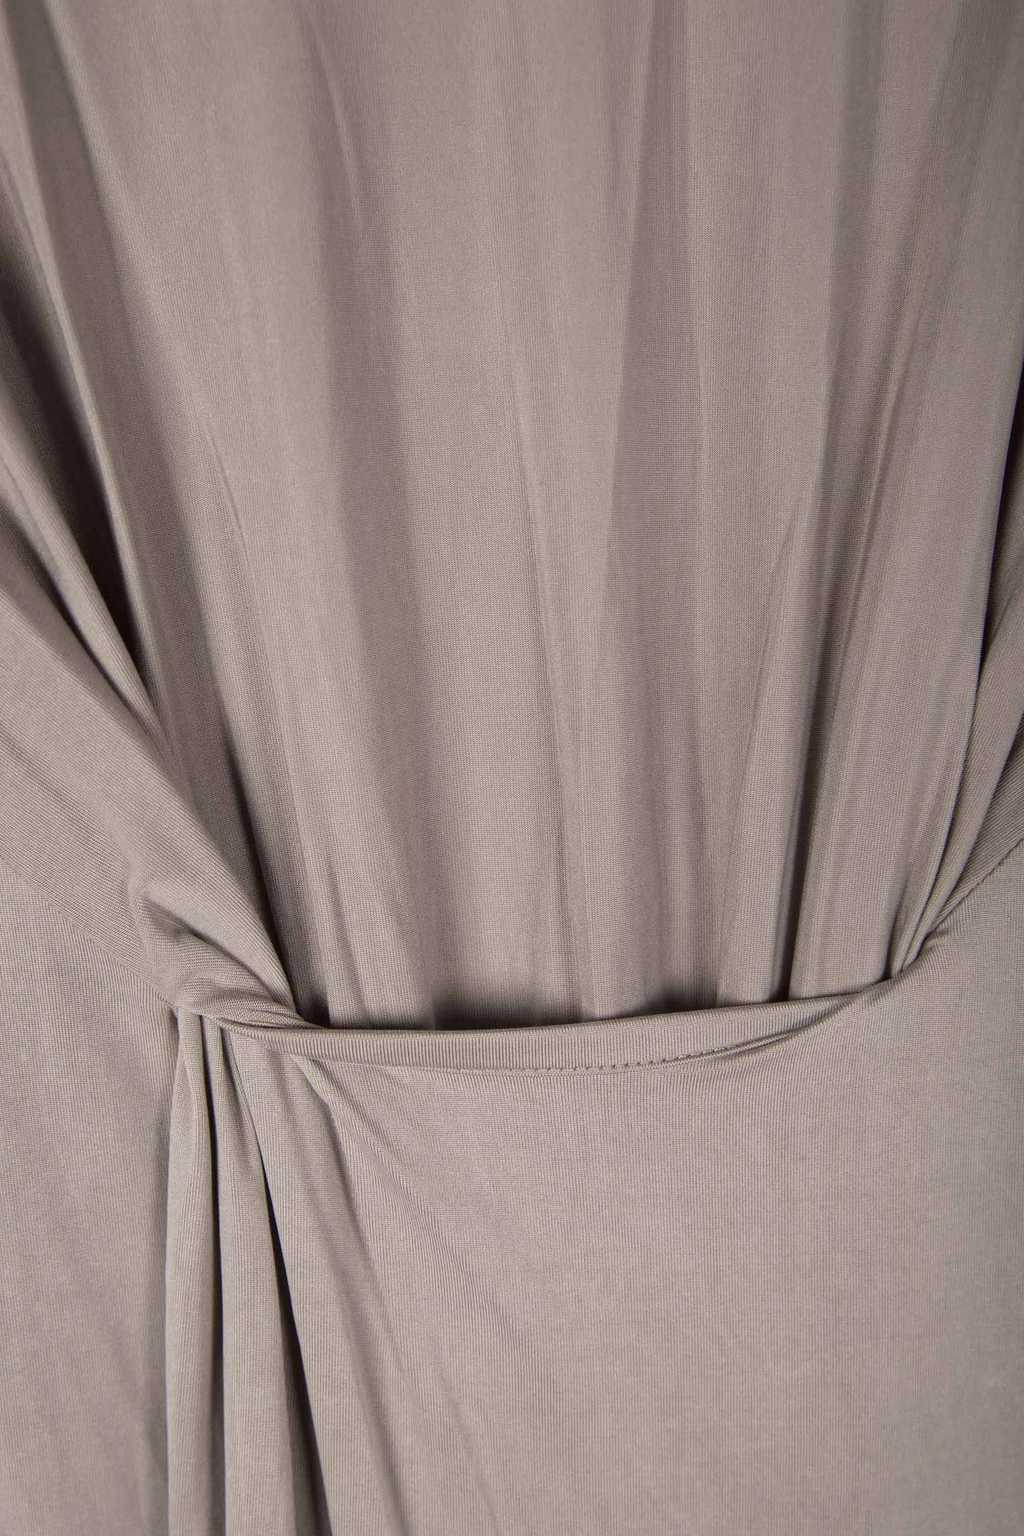 Dress 1673 Taupe 12